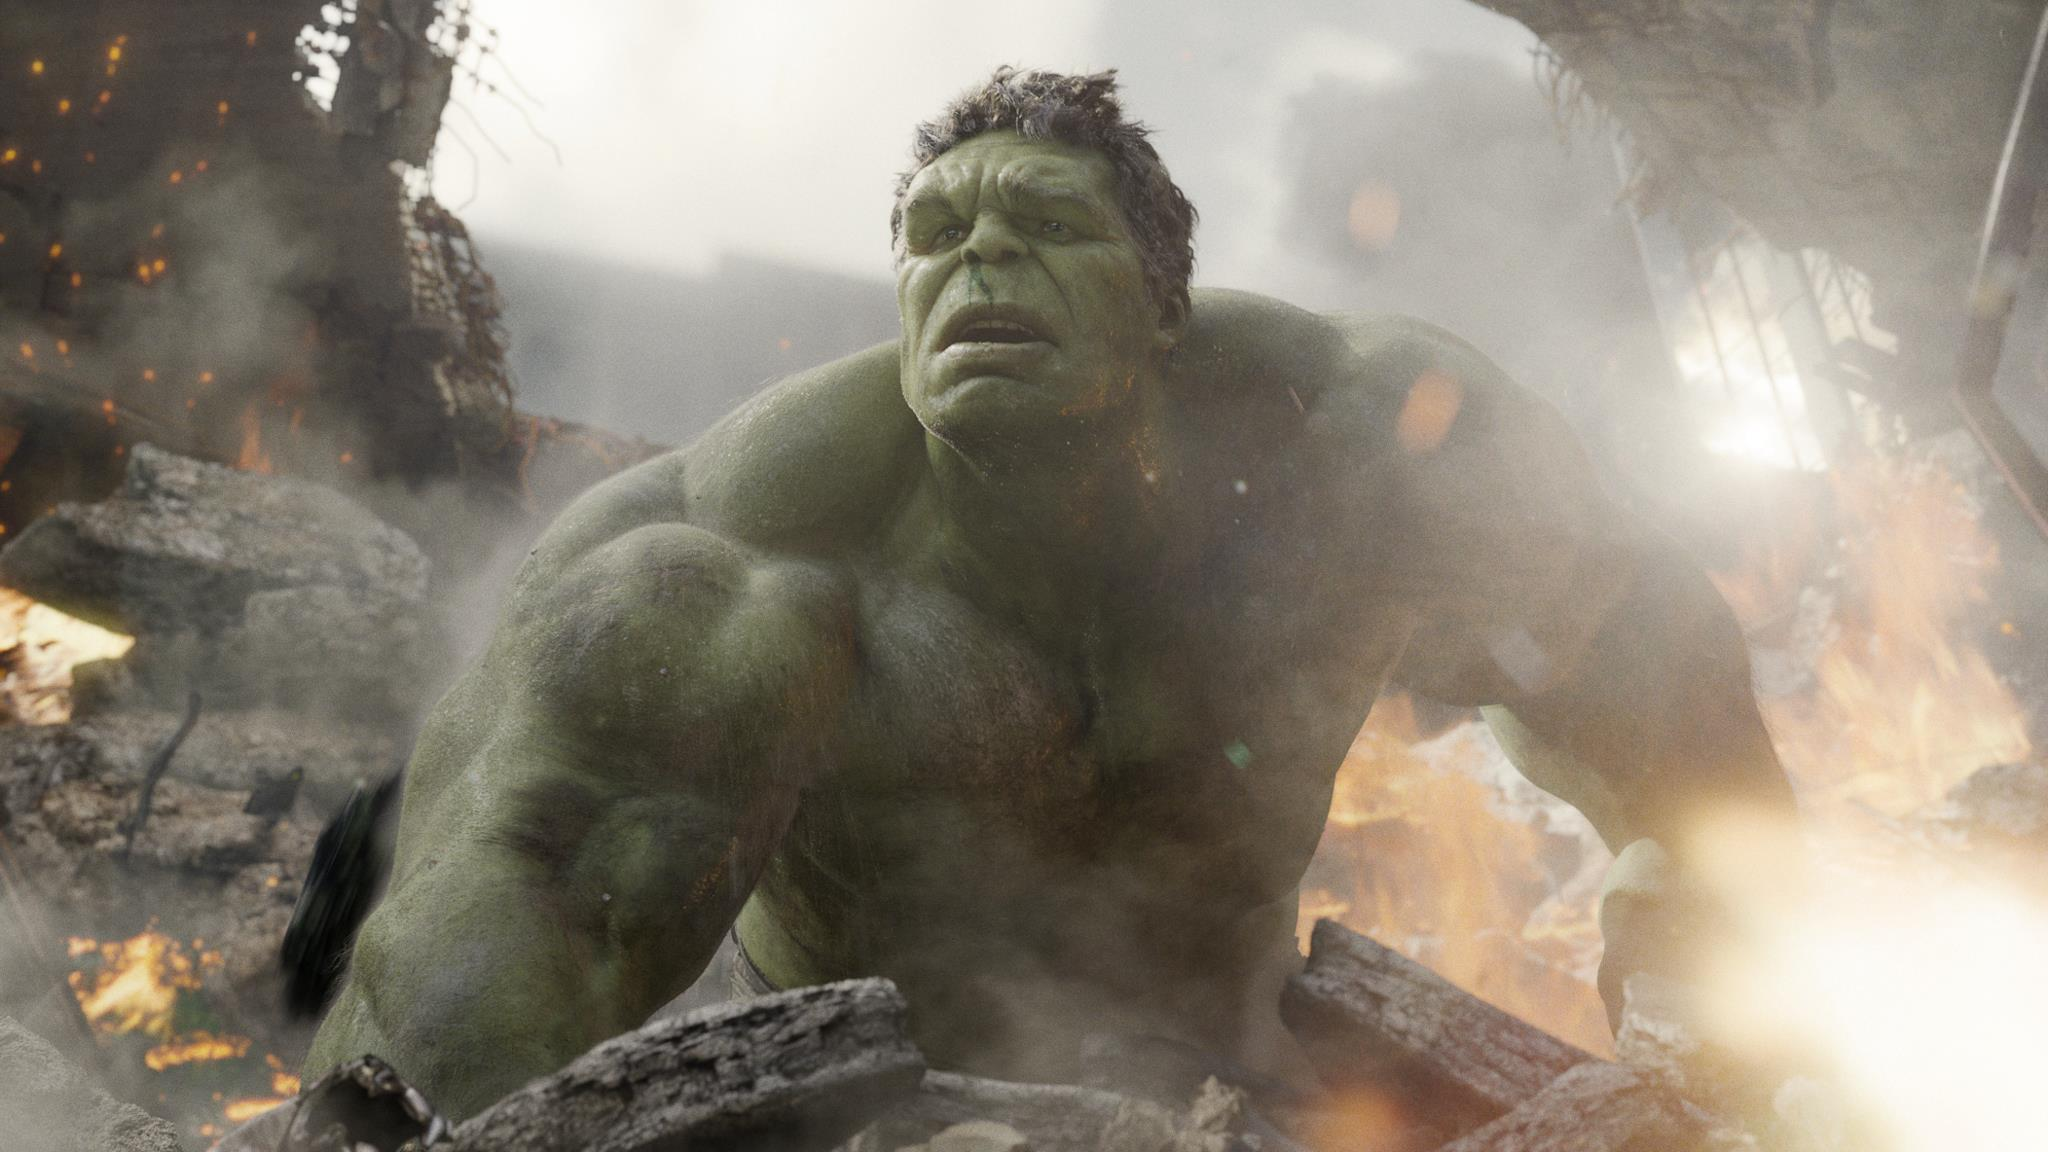 Eindelijk duidelijkheid rond The Avengers villains